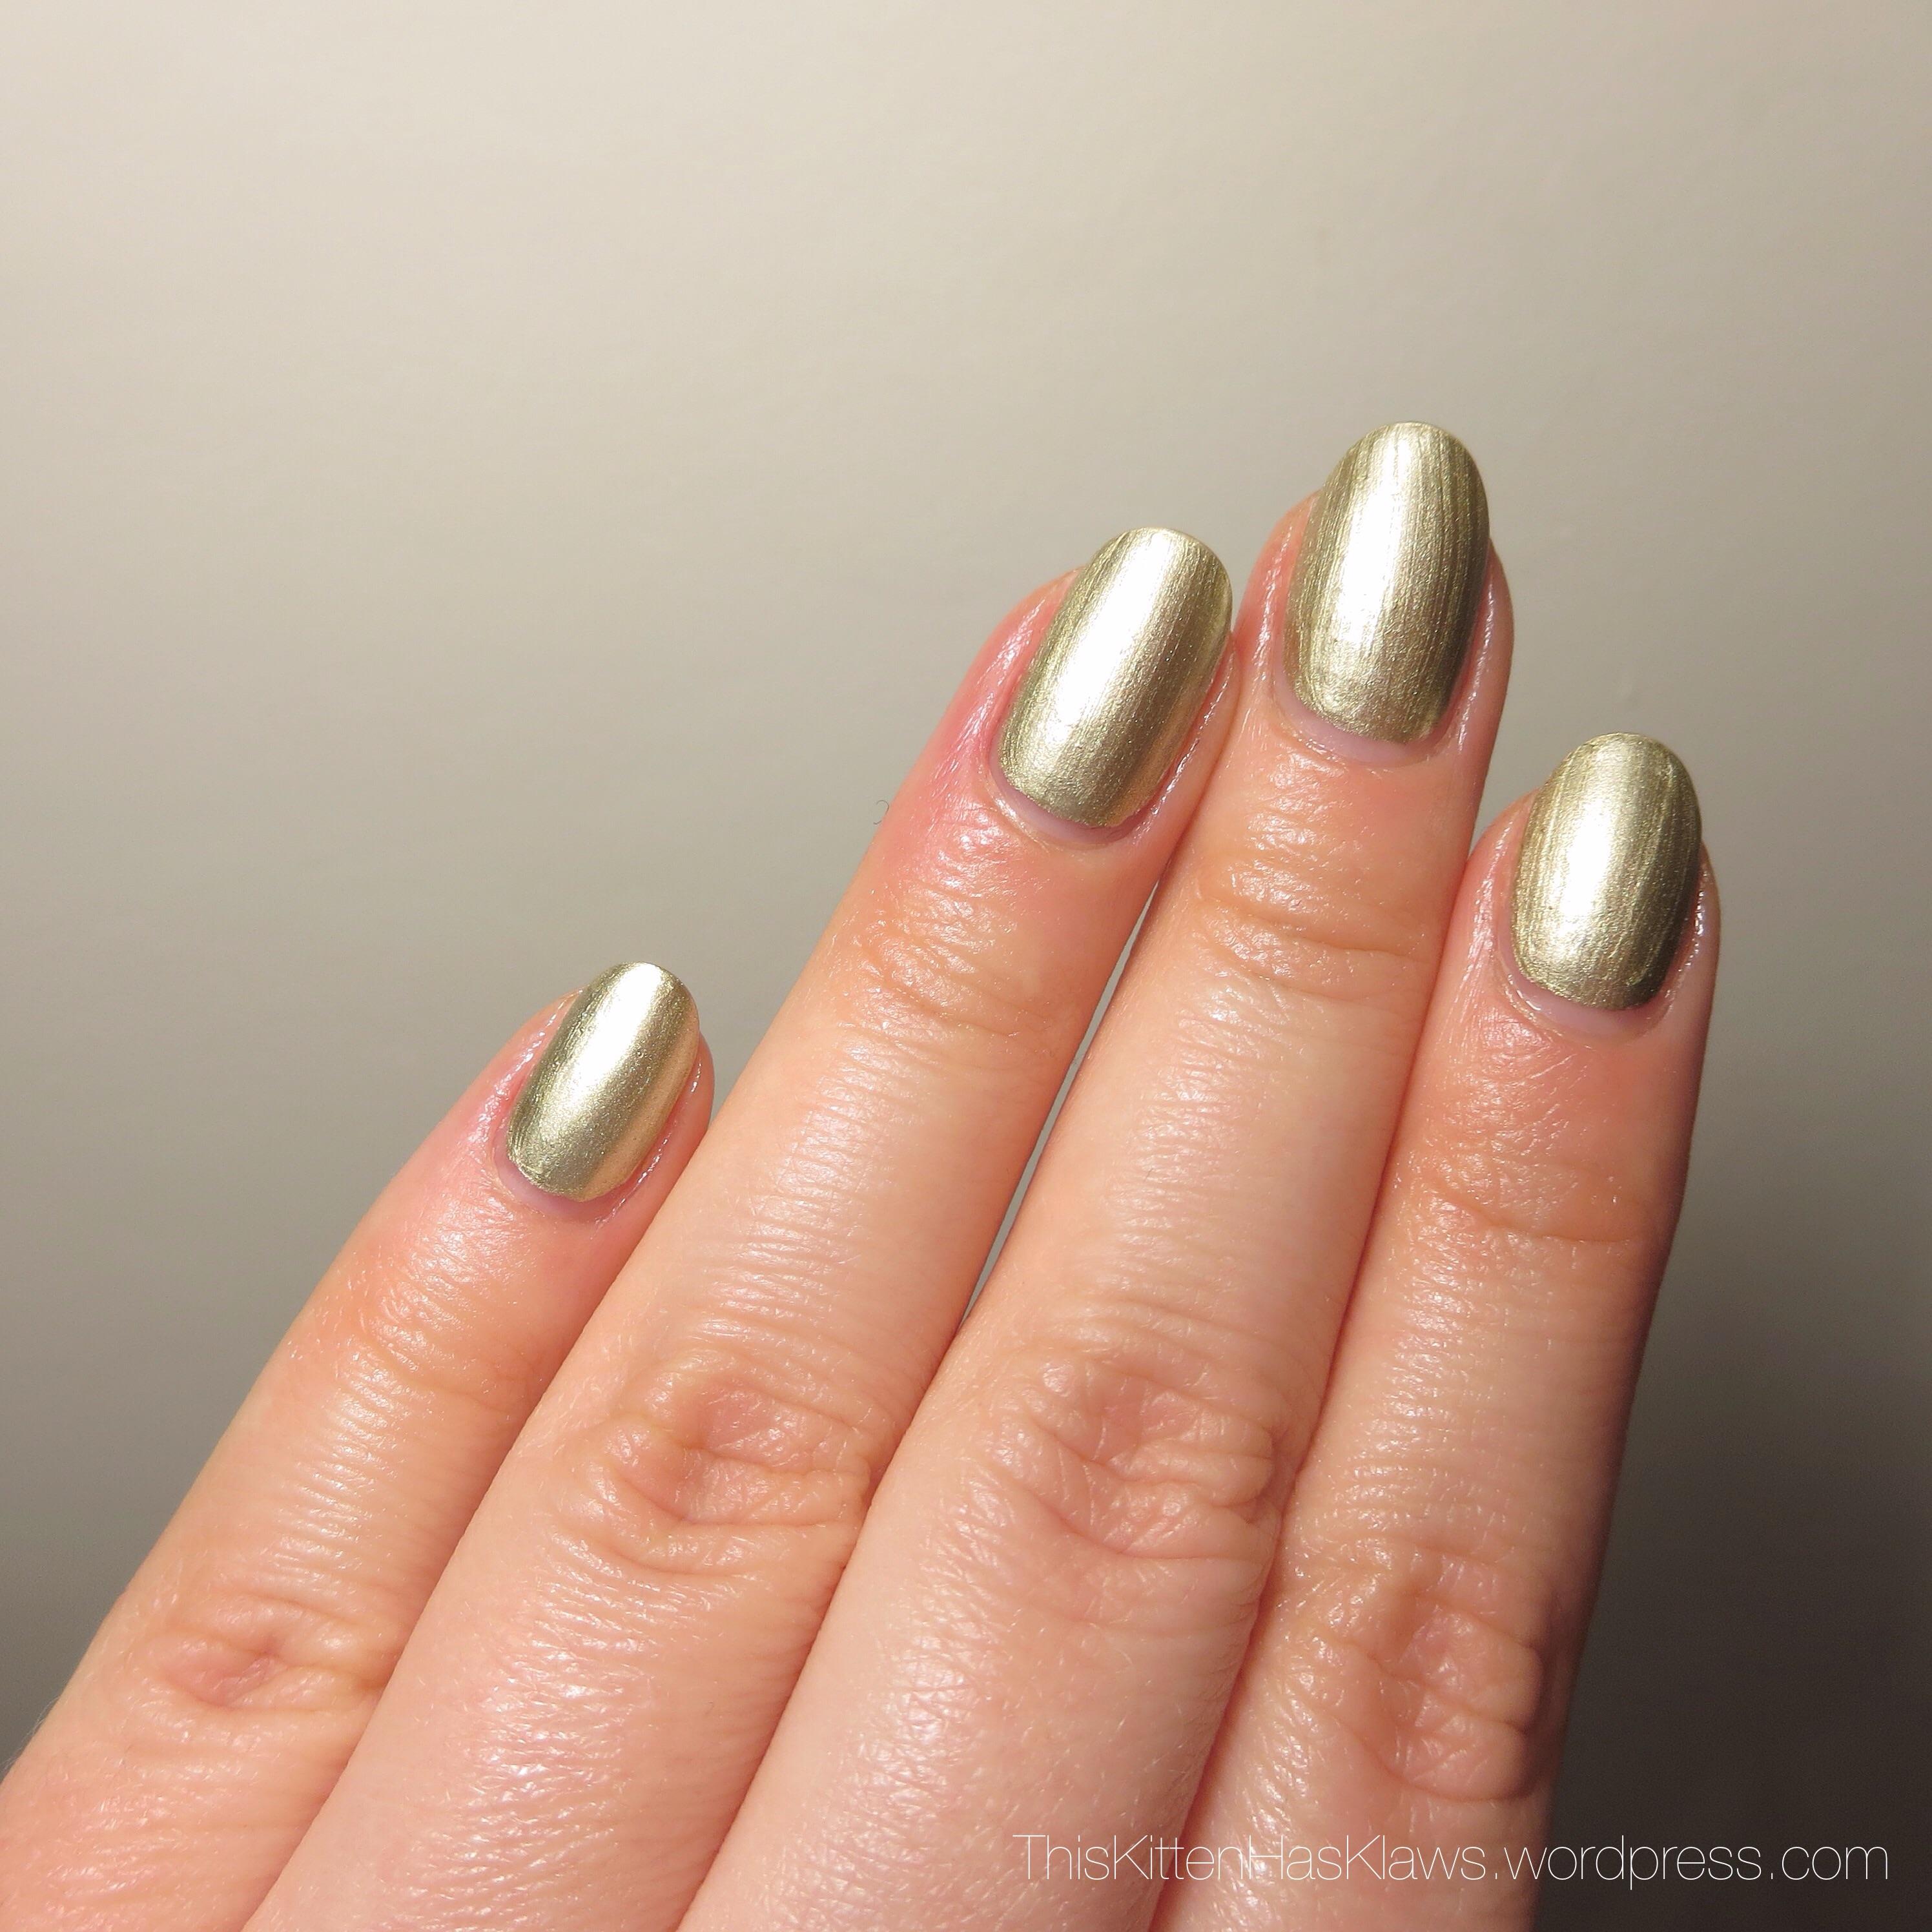 almond vs coffin nails photo - 2